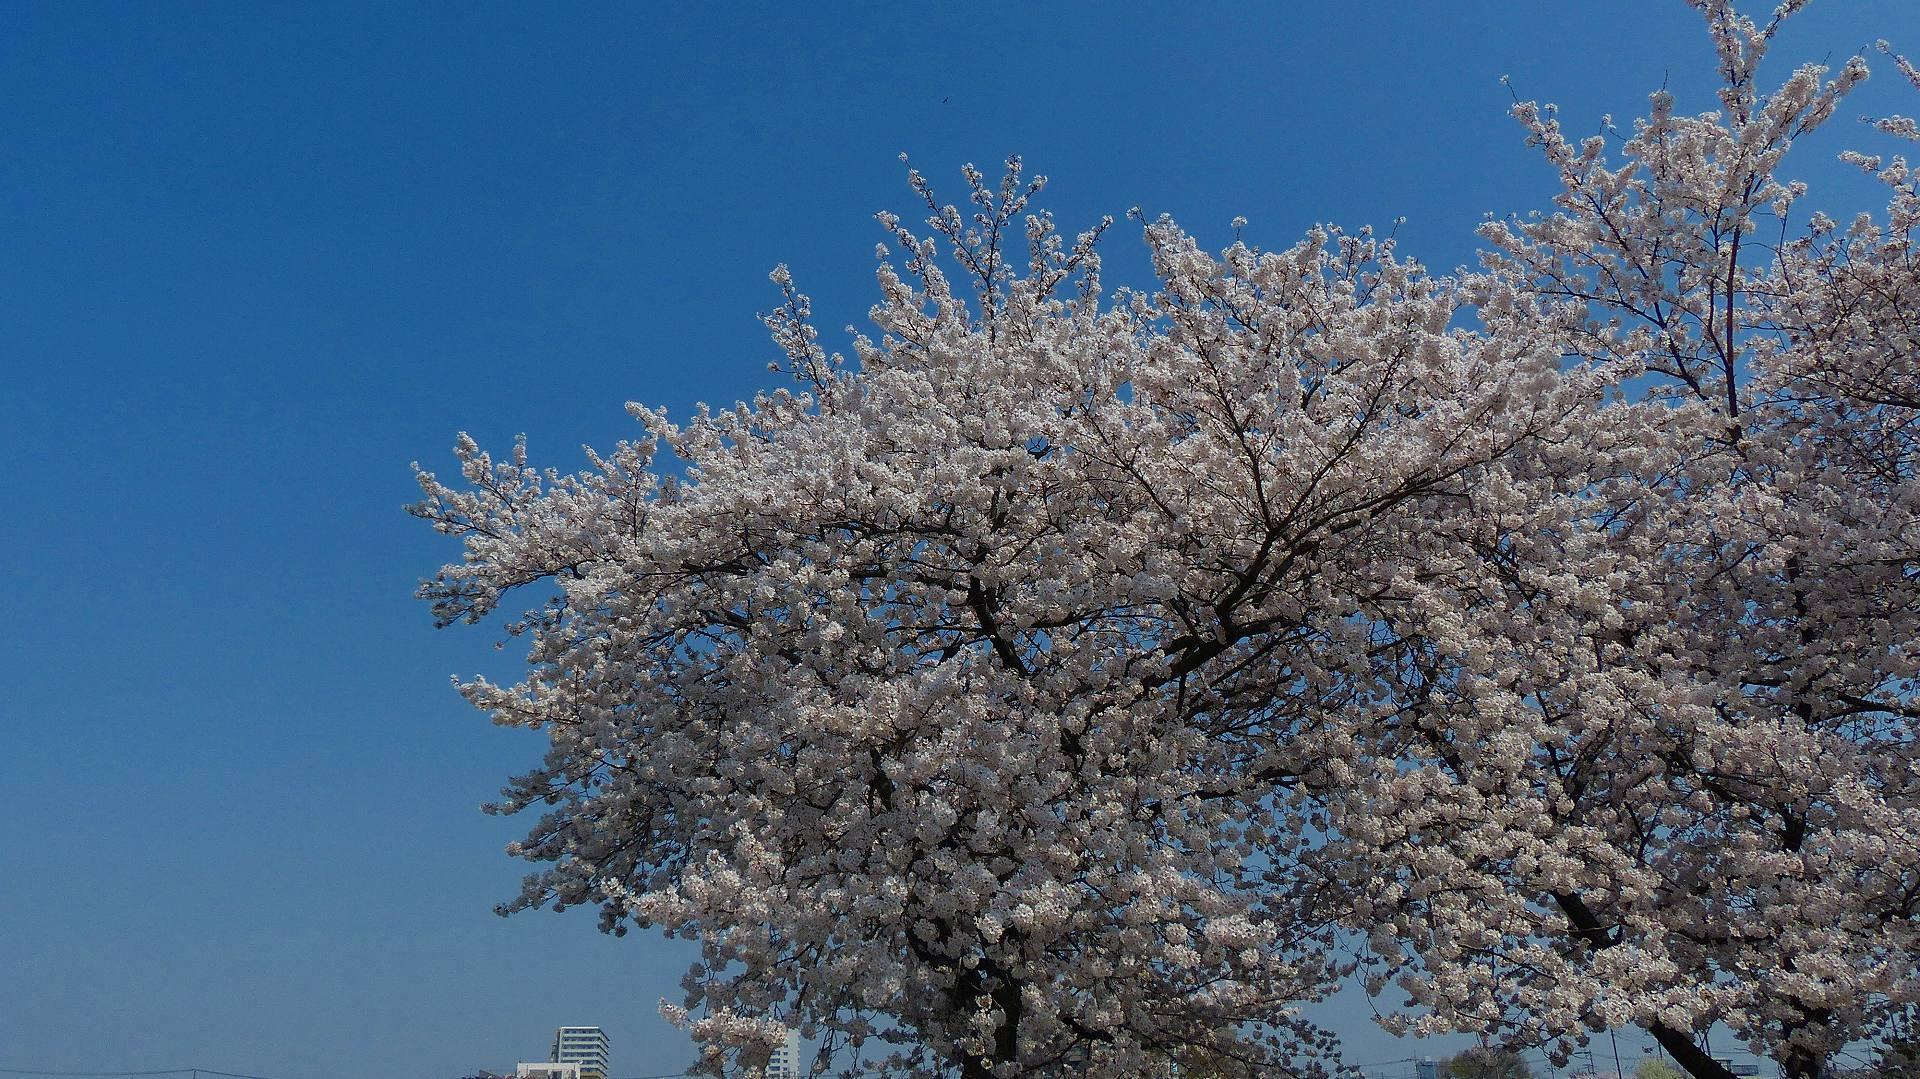 満開の桜を堪能! 【 2018 3/28(水) 】_a0185081_19304457.jpg